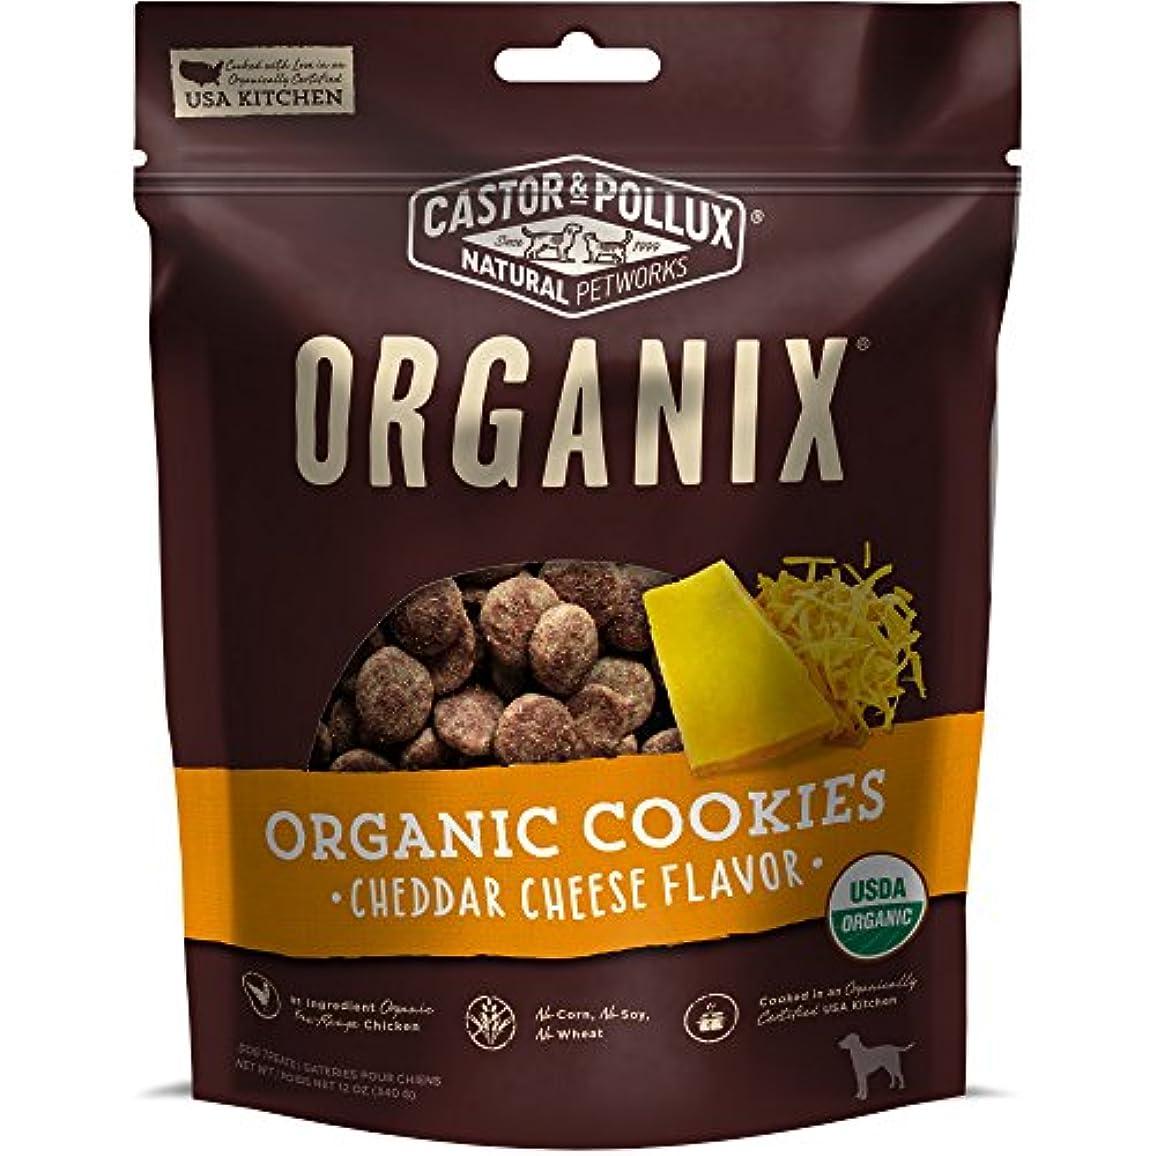 Organix Organic Dog Cookies Treats, Cheddar Cheese Flavor by Organix